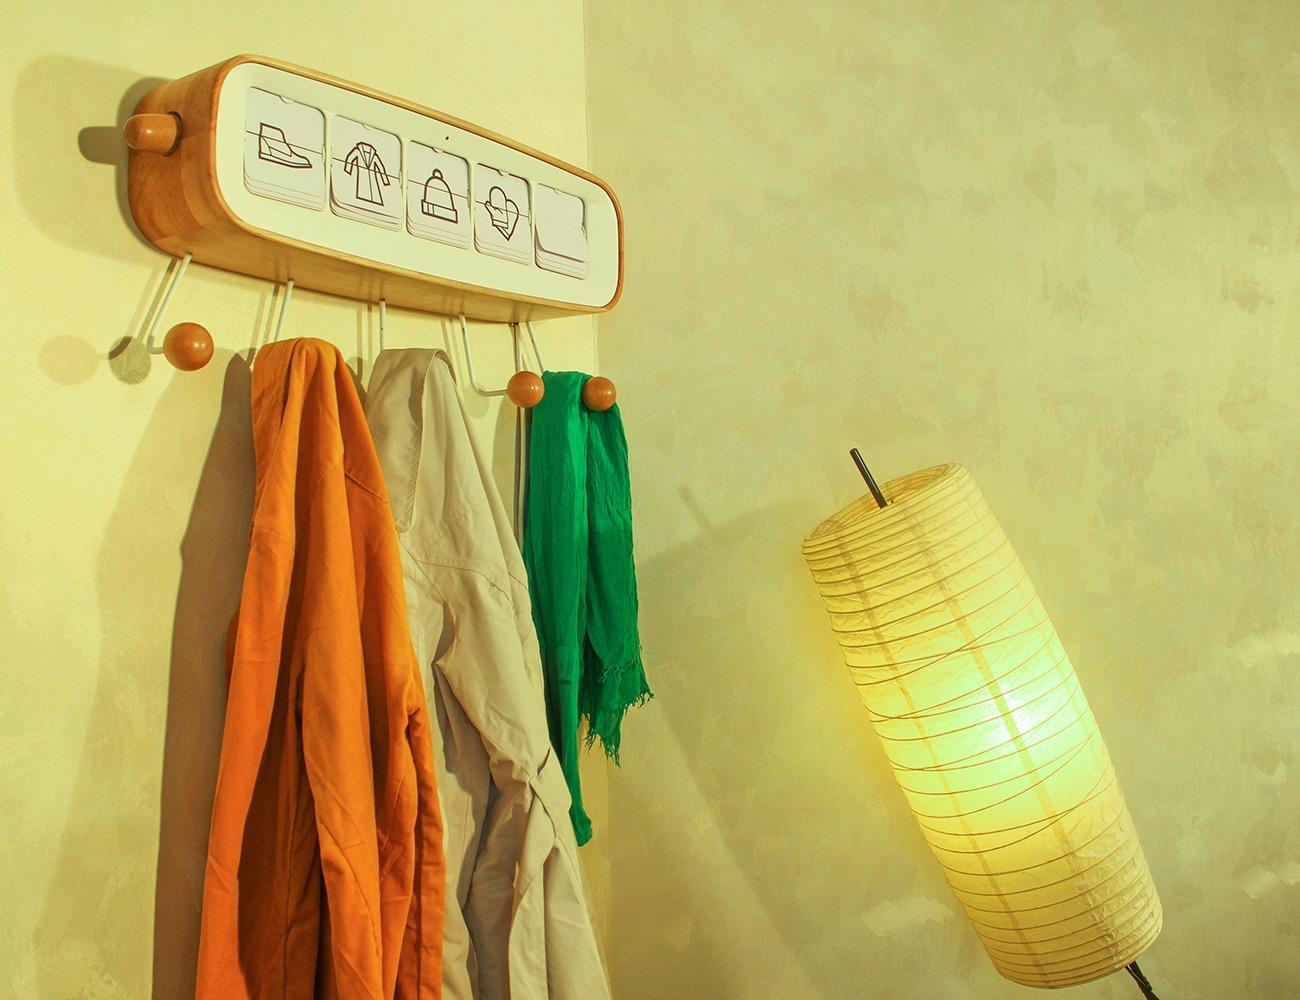 Take Off Connected Smart Hanger